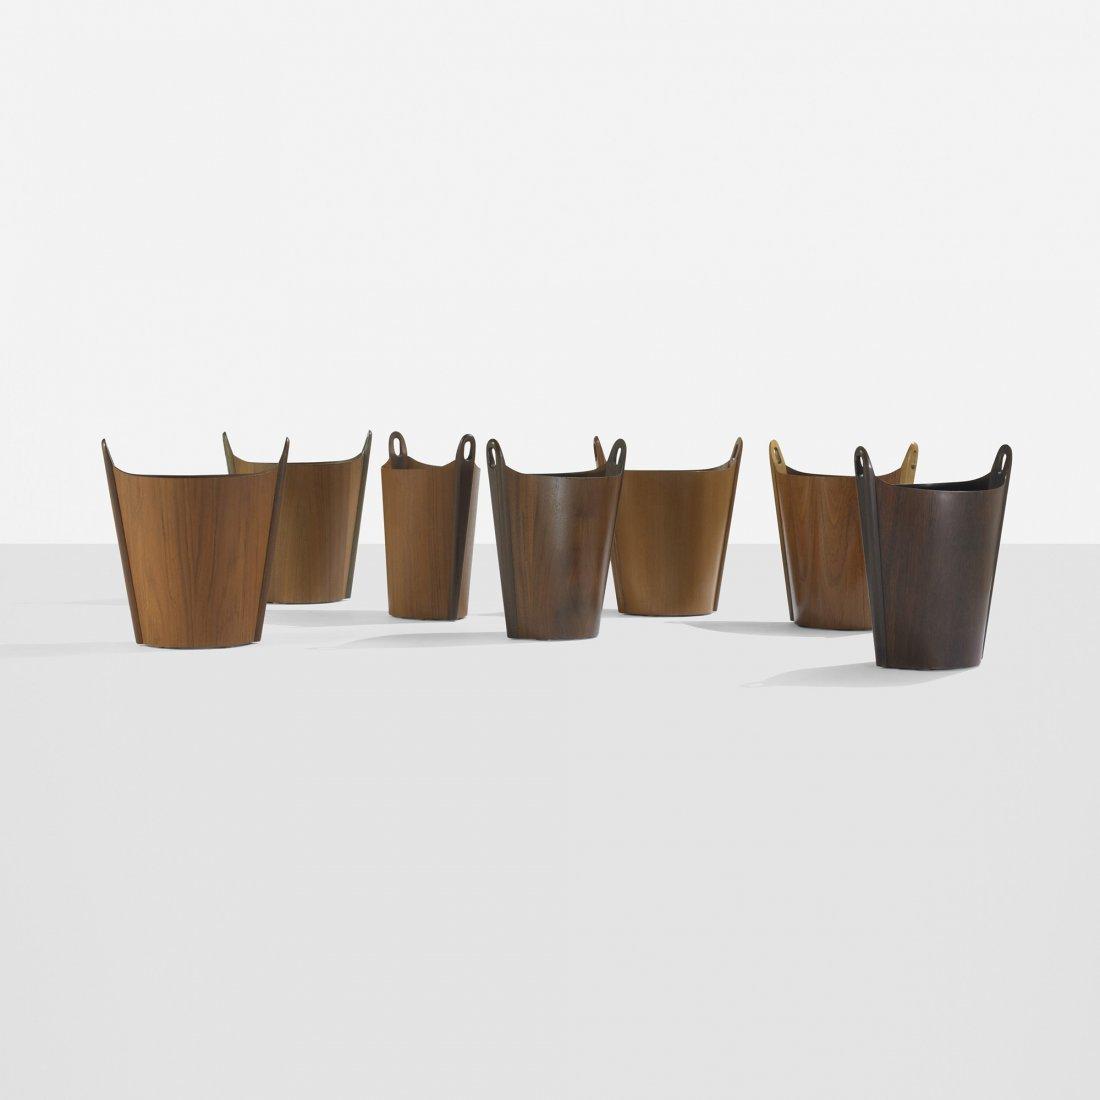 103: P.S. Heggen wastepaper baskets, set of seven